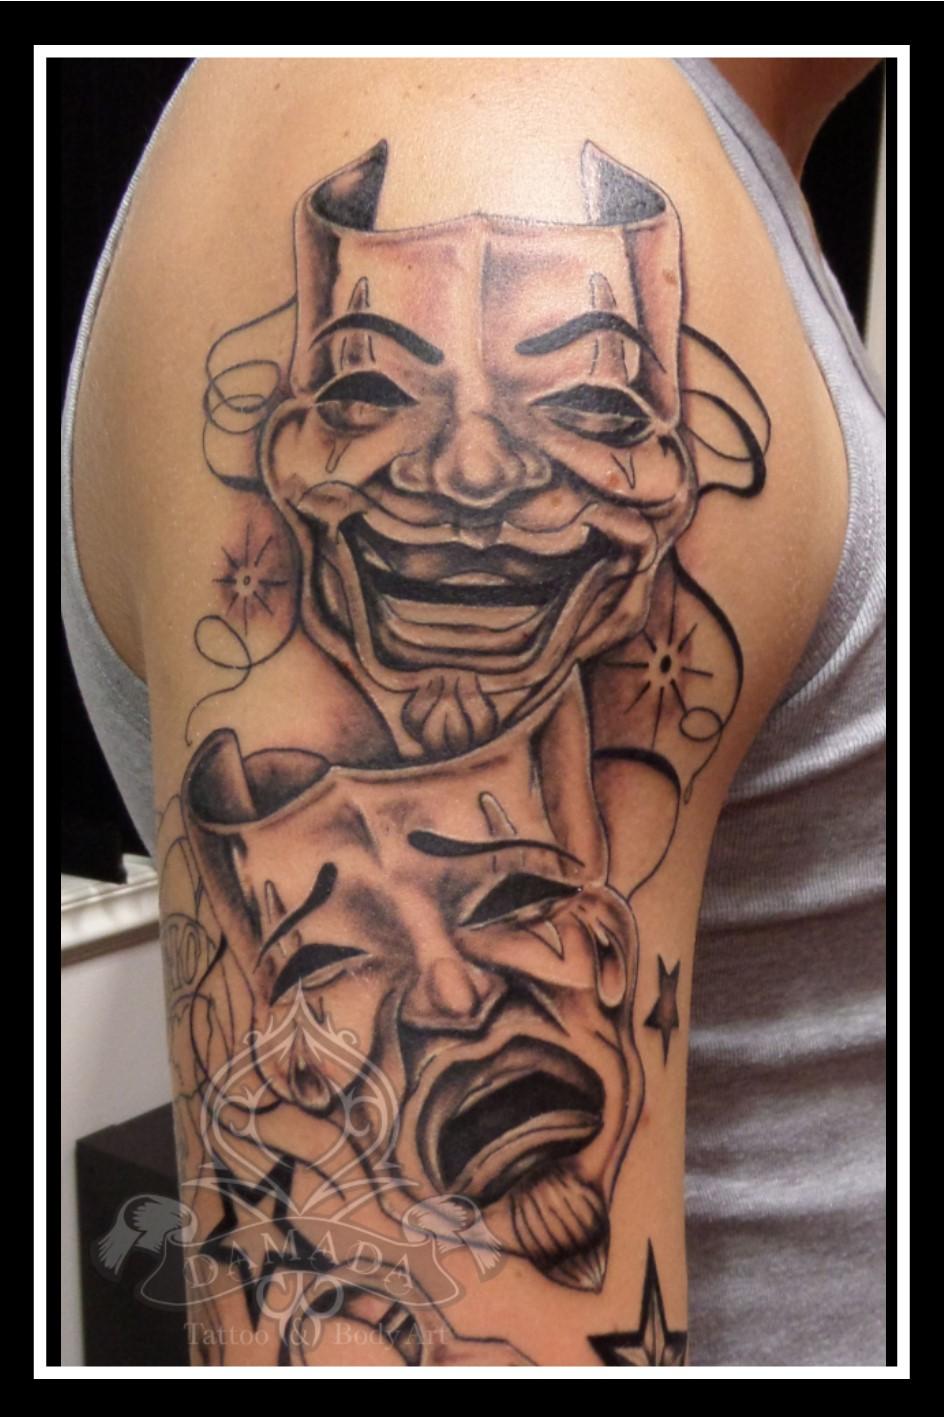 Crynow Smilelater